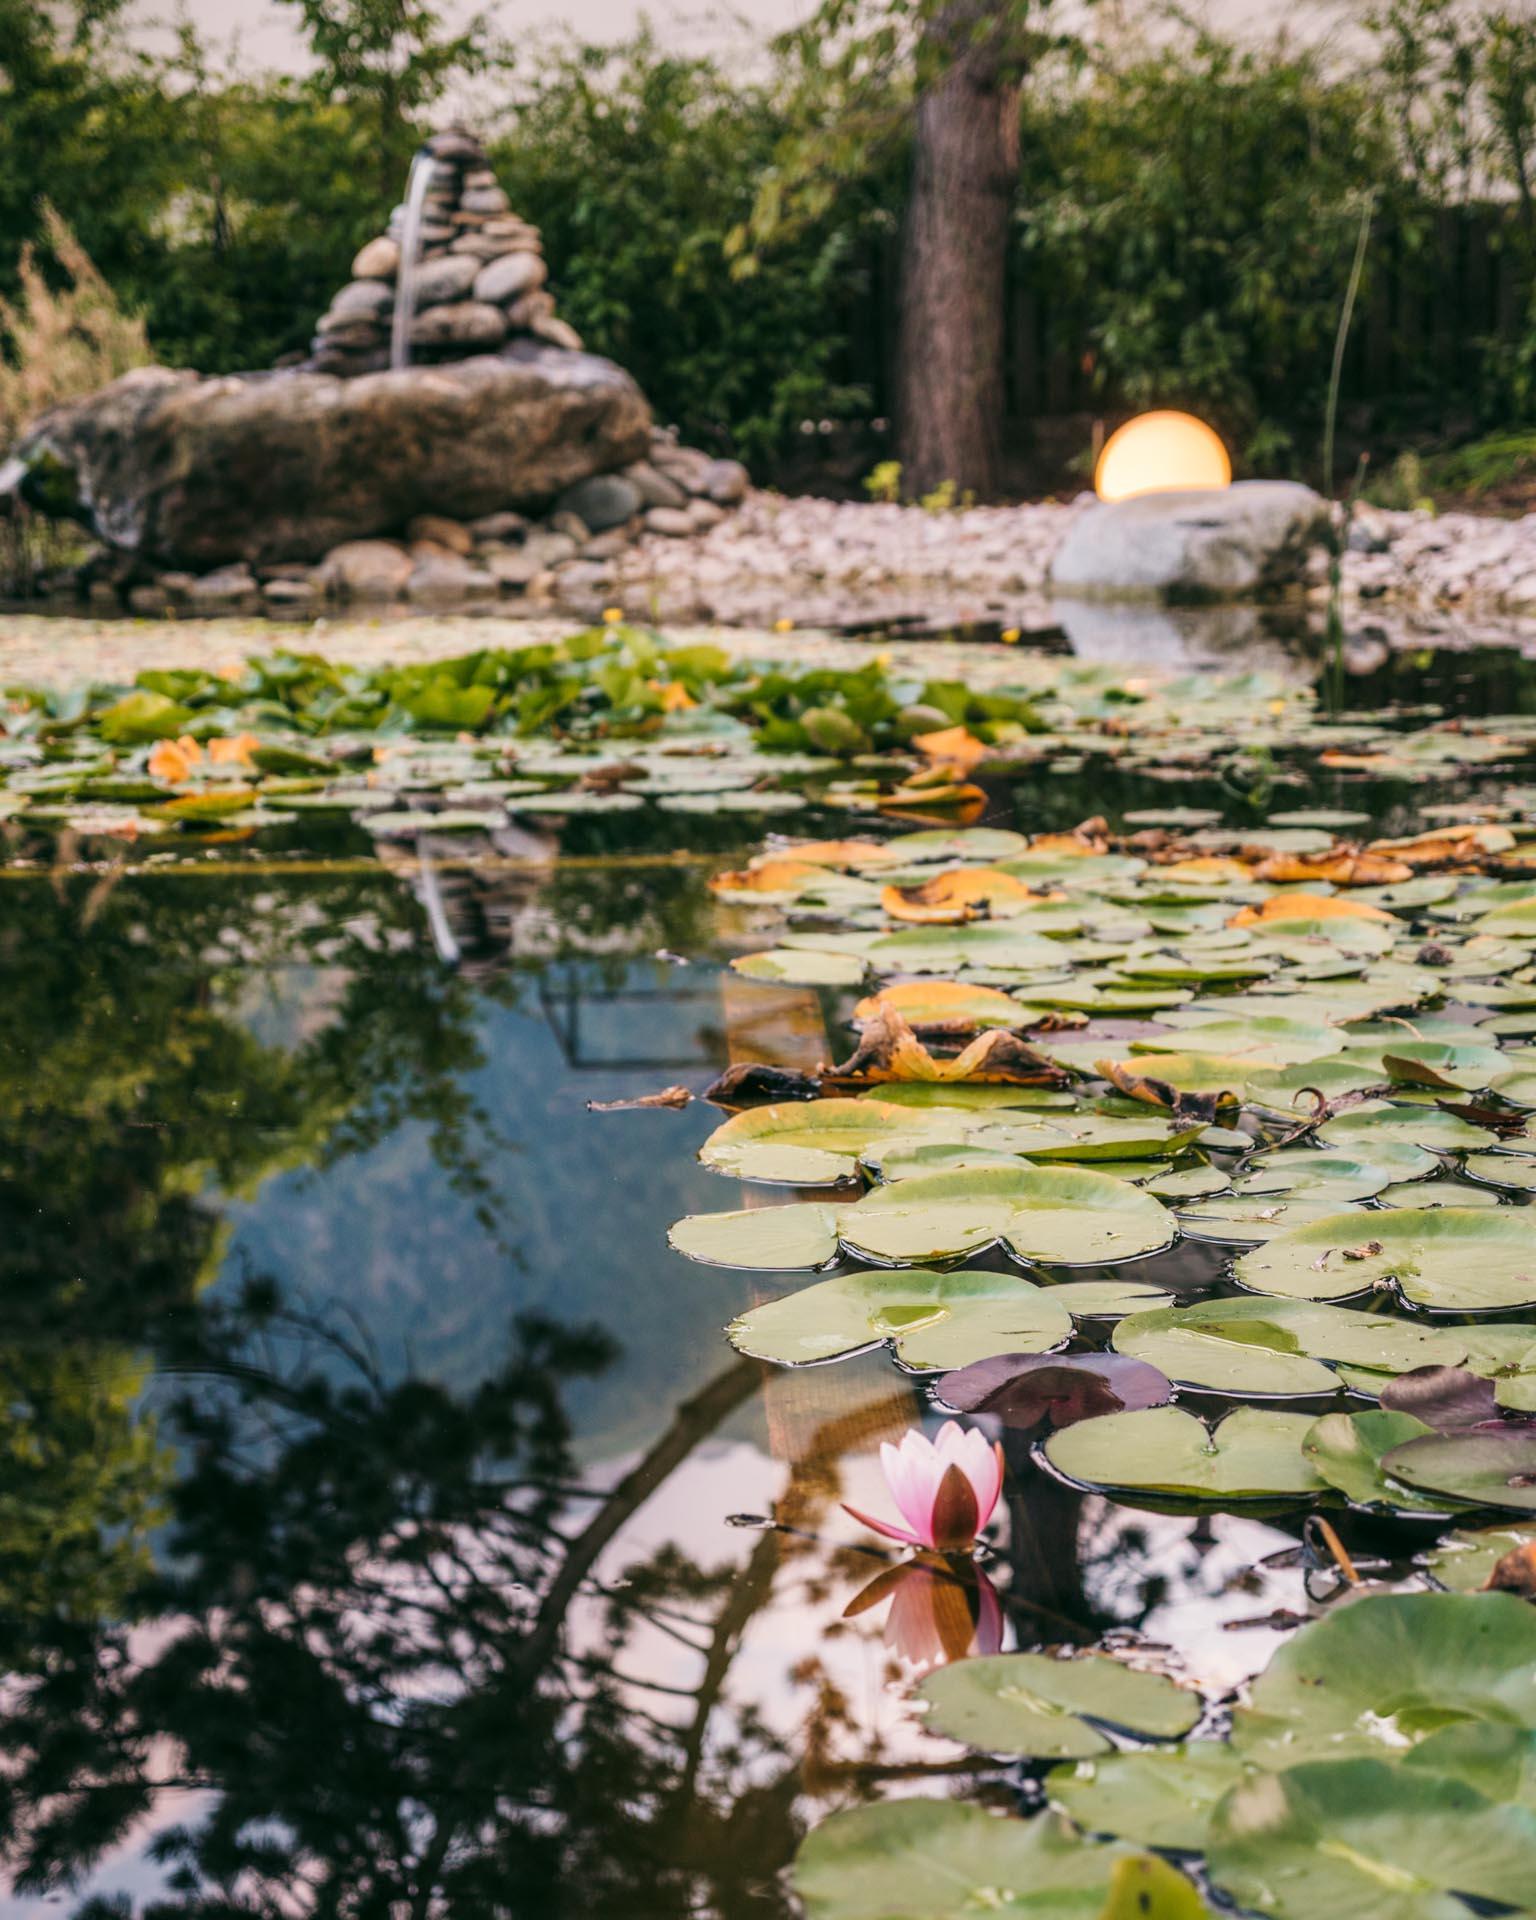 The pond